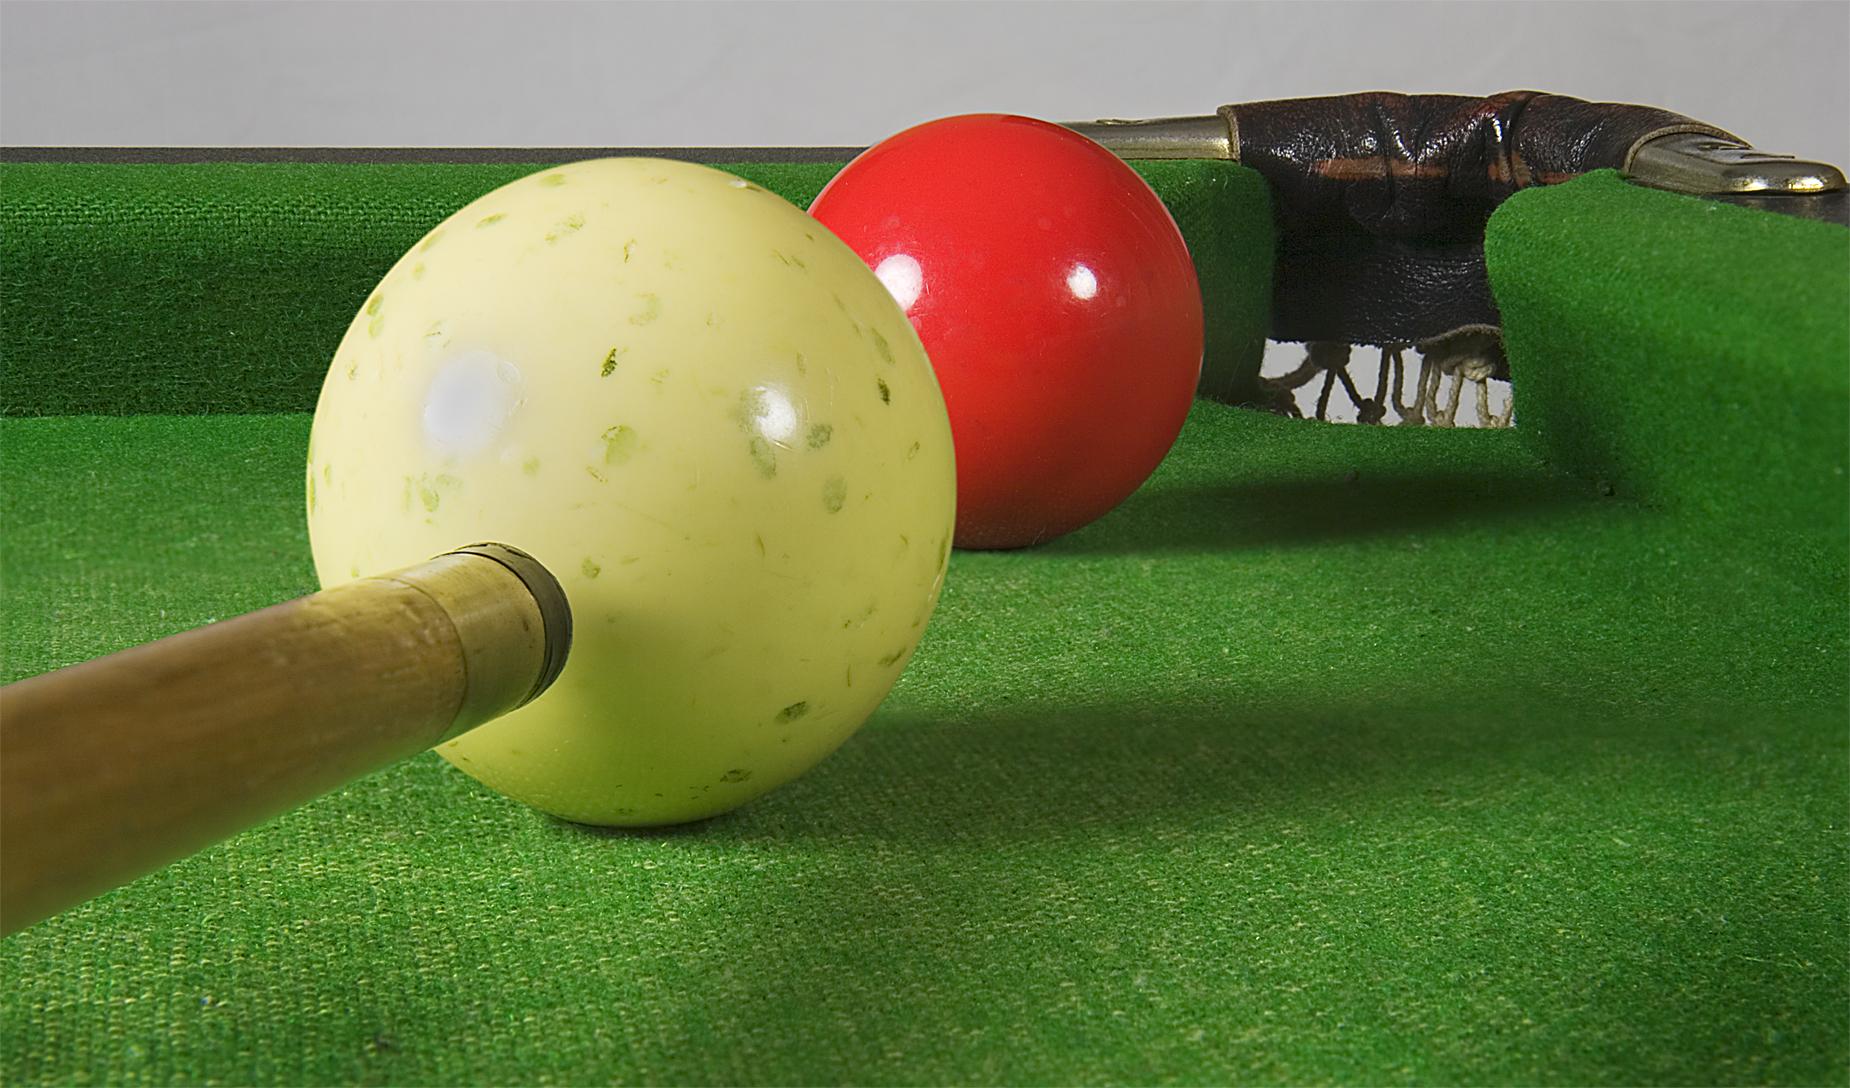 Depiction of Deporte de pelota